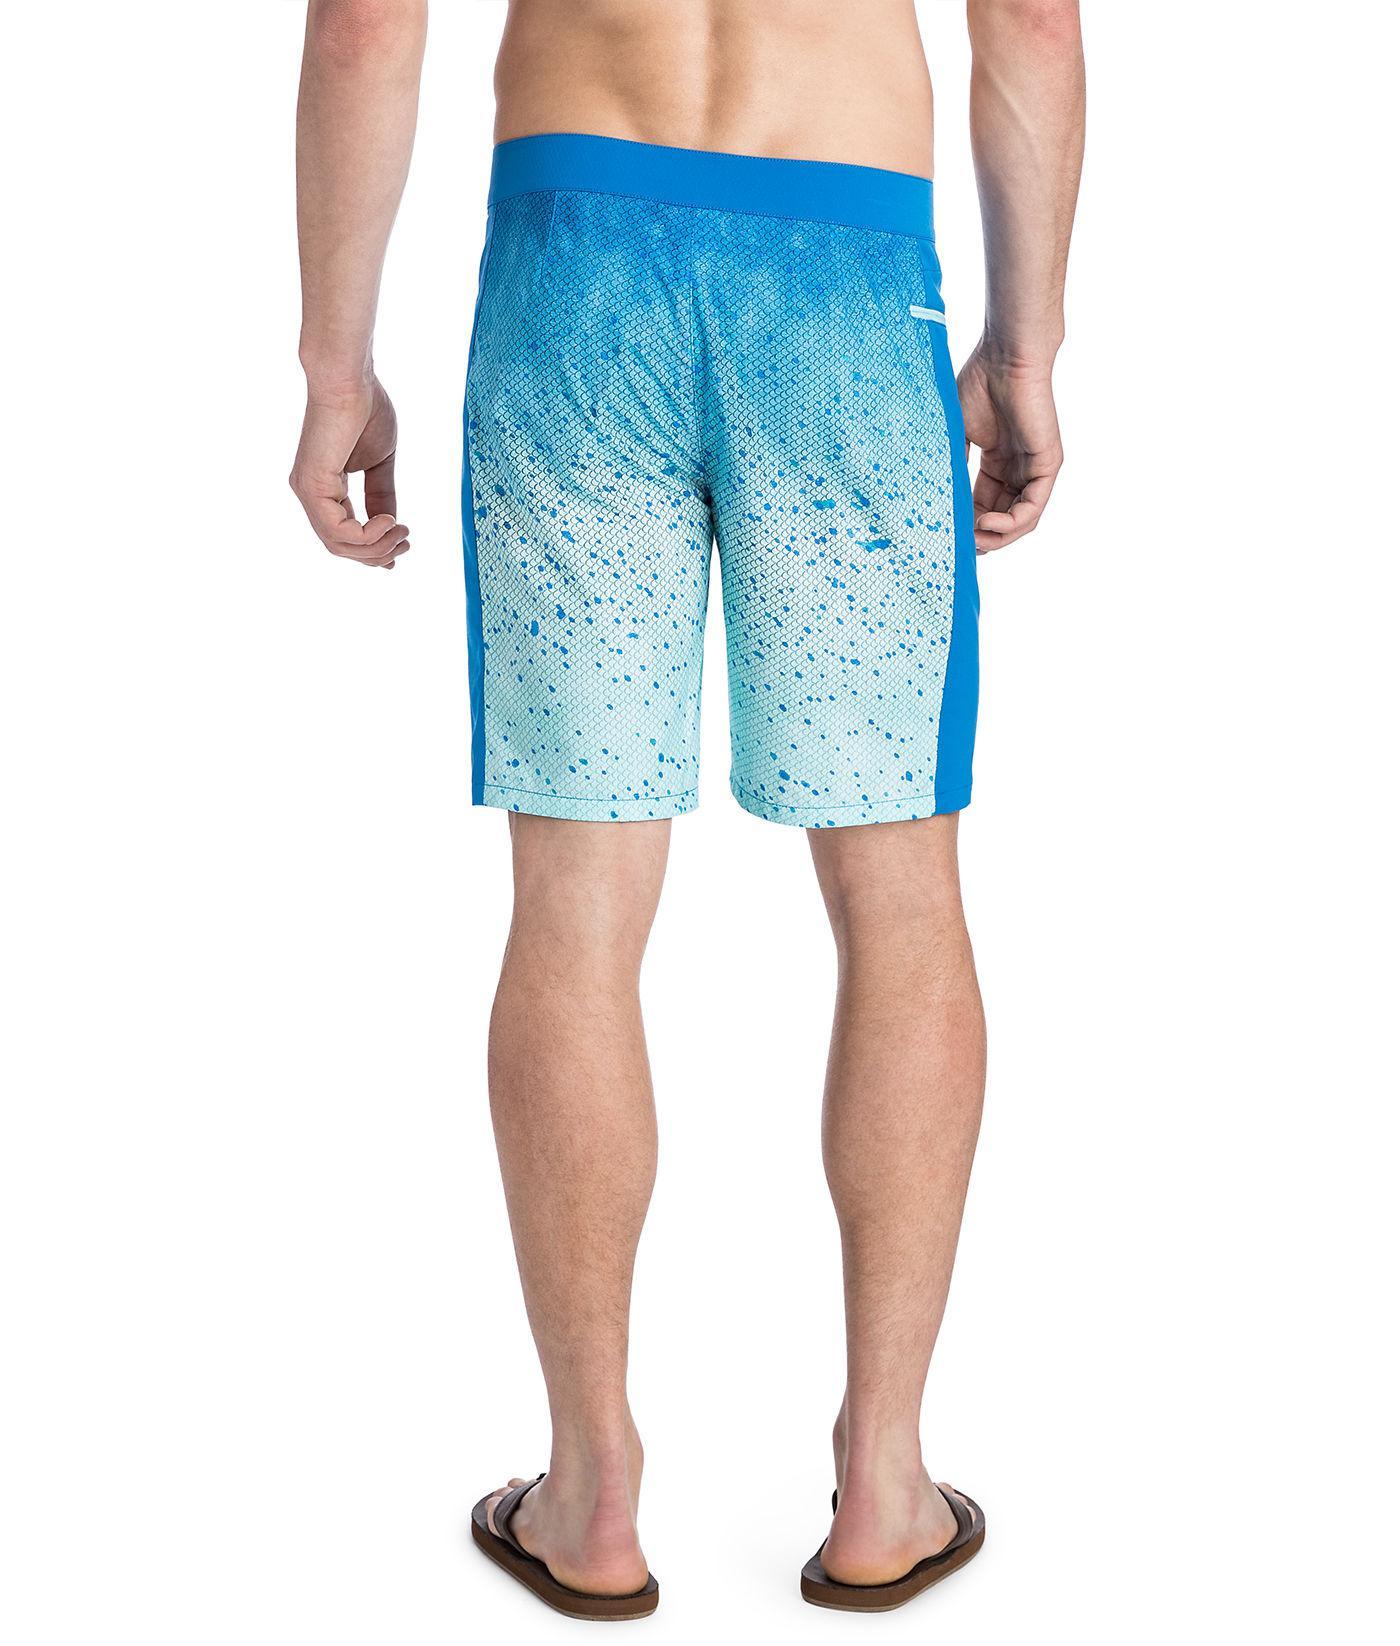 bc3fad1563ca9 Lyst - Vineyard Vines Mahi Pieced Tech Board Shorts in Blue for Men